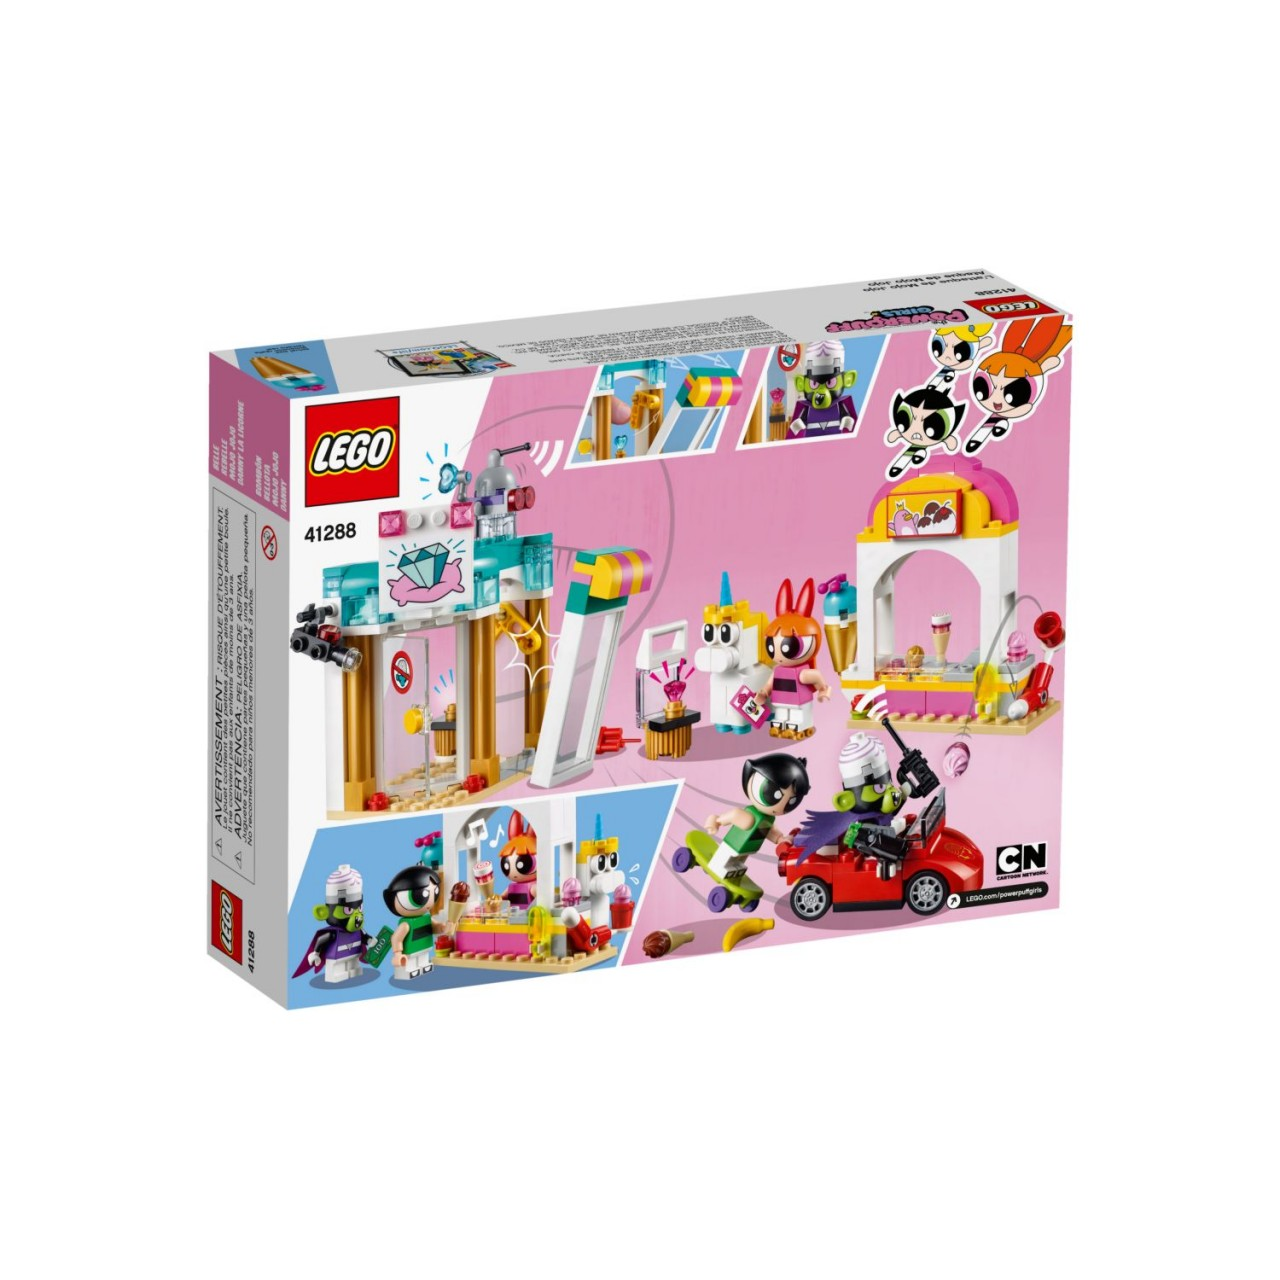 LEGO THE POWERPUFF GIRLS 41288 Angriff von Mojo Jojo